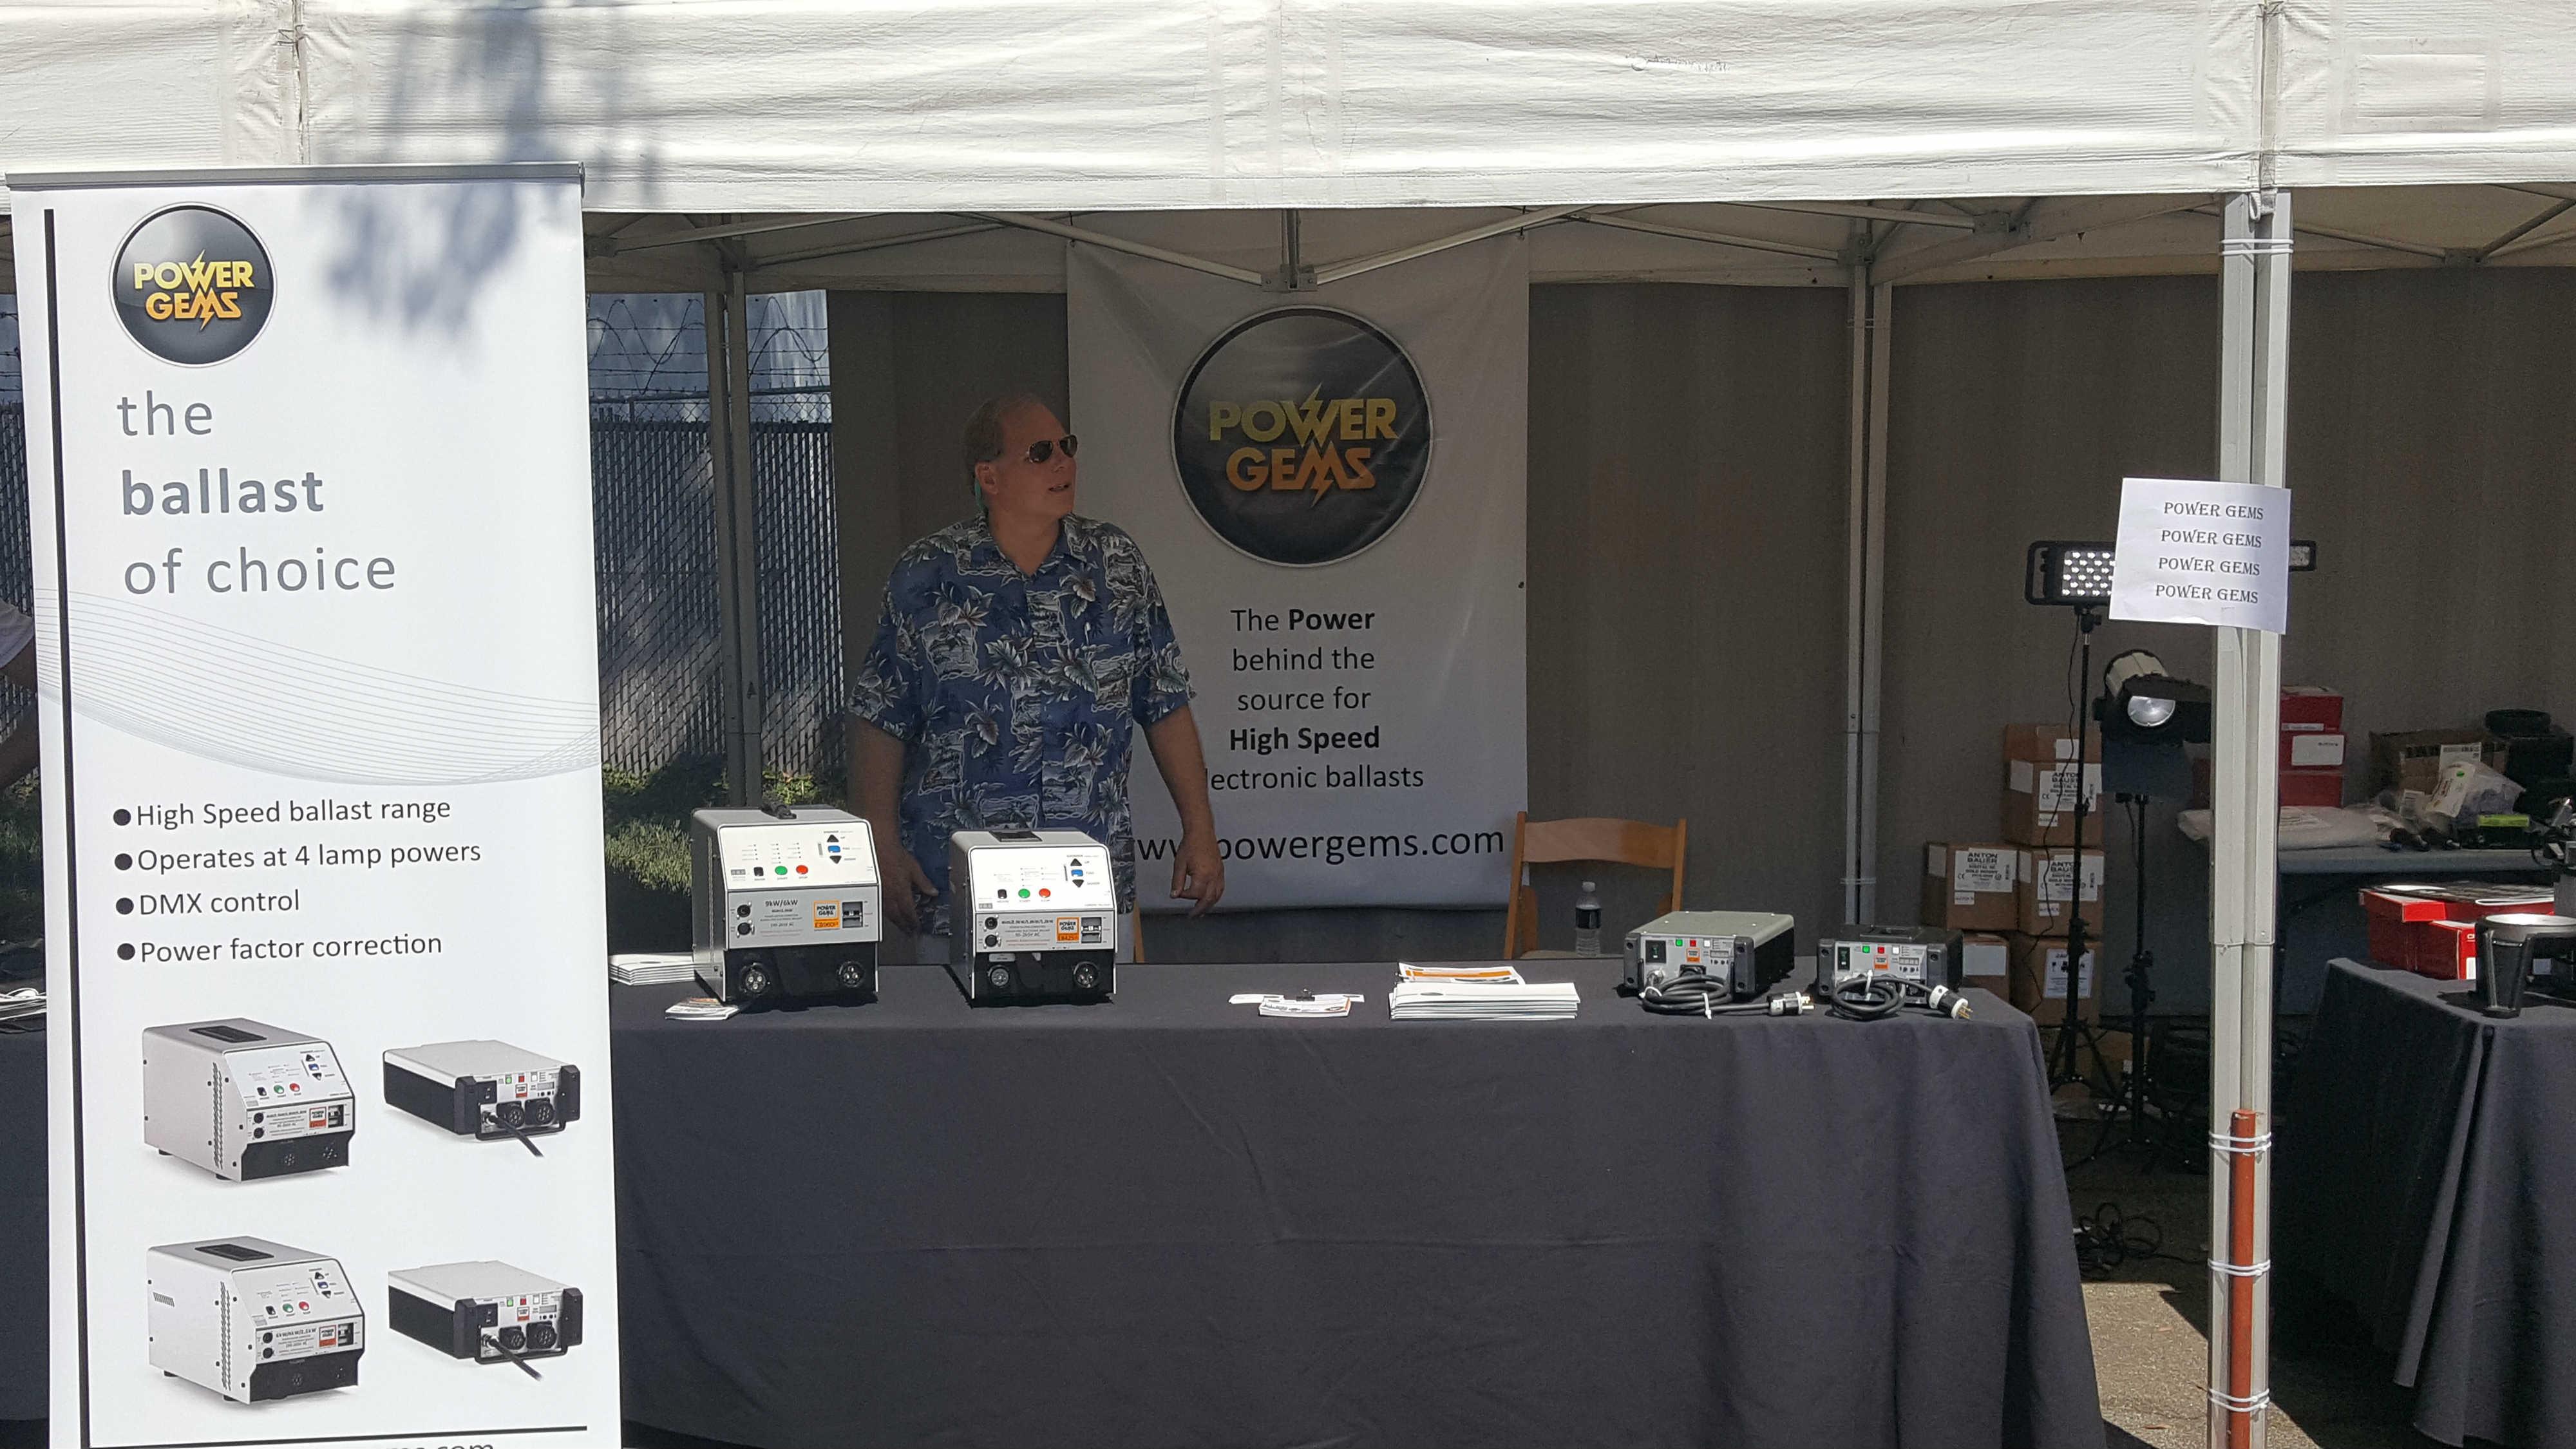 Power Gems booth manned by Chip Harley, at Matthews Garage Sale